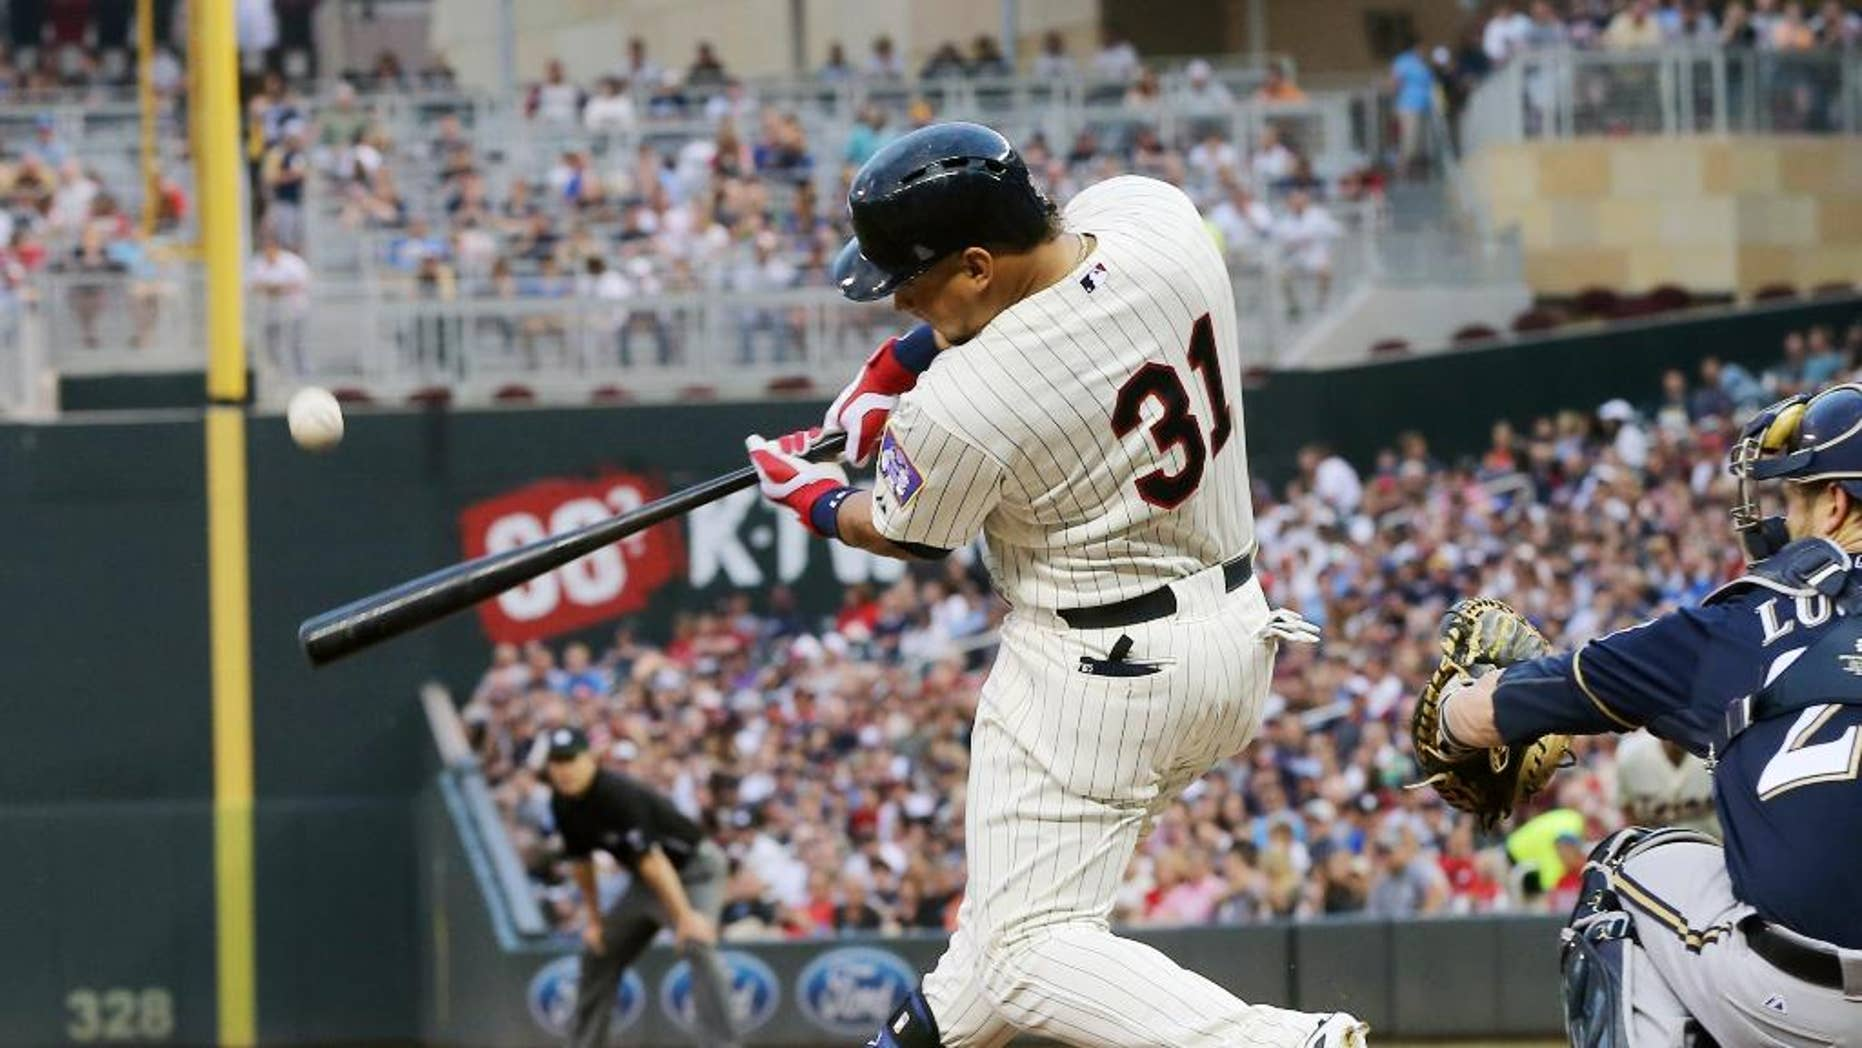 Minnesota Twins' Oswaldo Arcia hits a three-run home run off Milwaukee Brewers  pitcher Marco Estrada in the fourth inning of a baseball game, Wednesday, June 4, 2014, in Minneapolis. (AP Photo/Jim Mone)